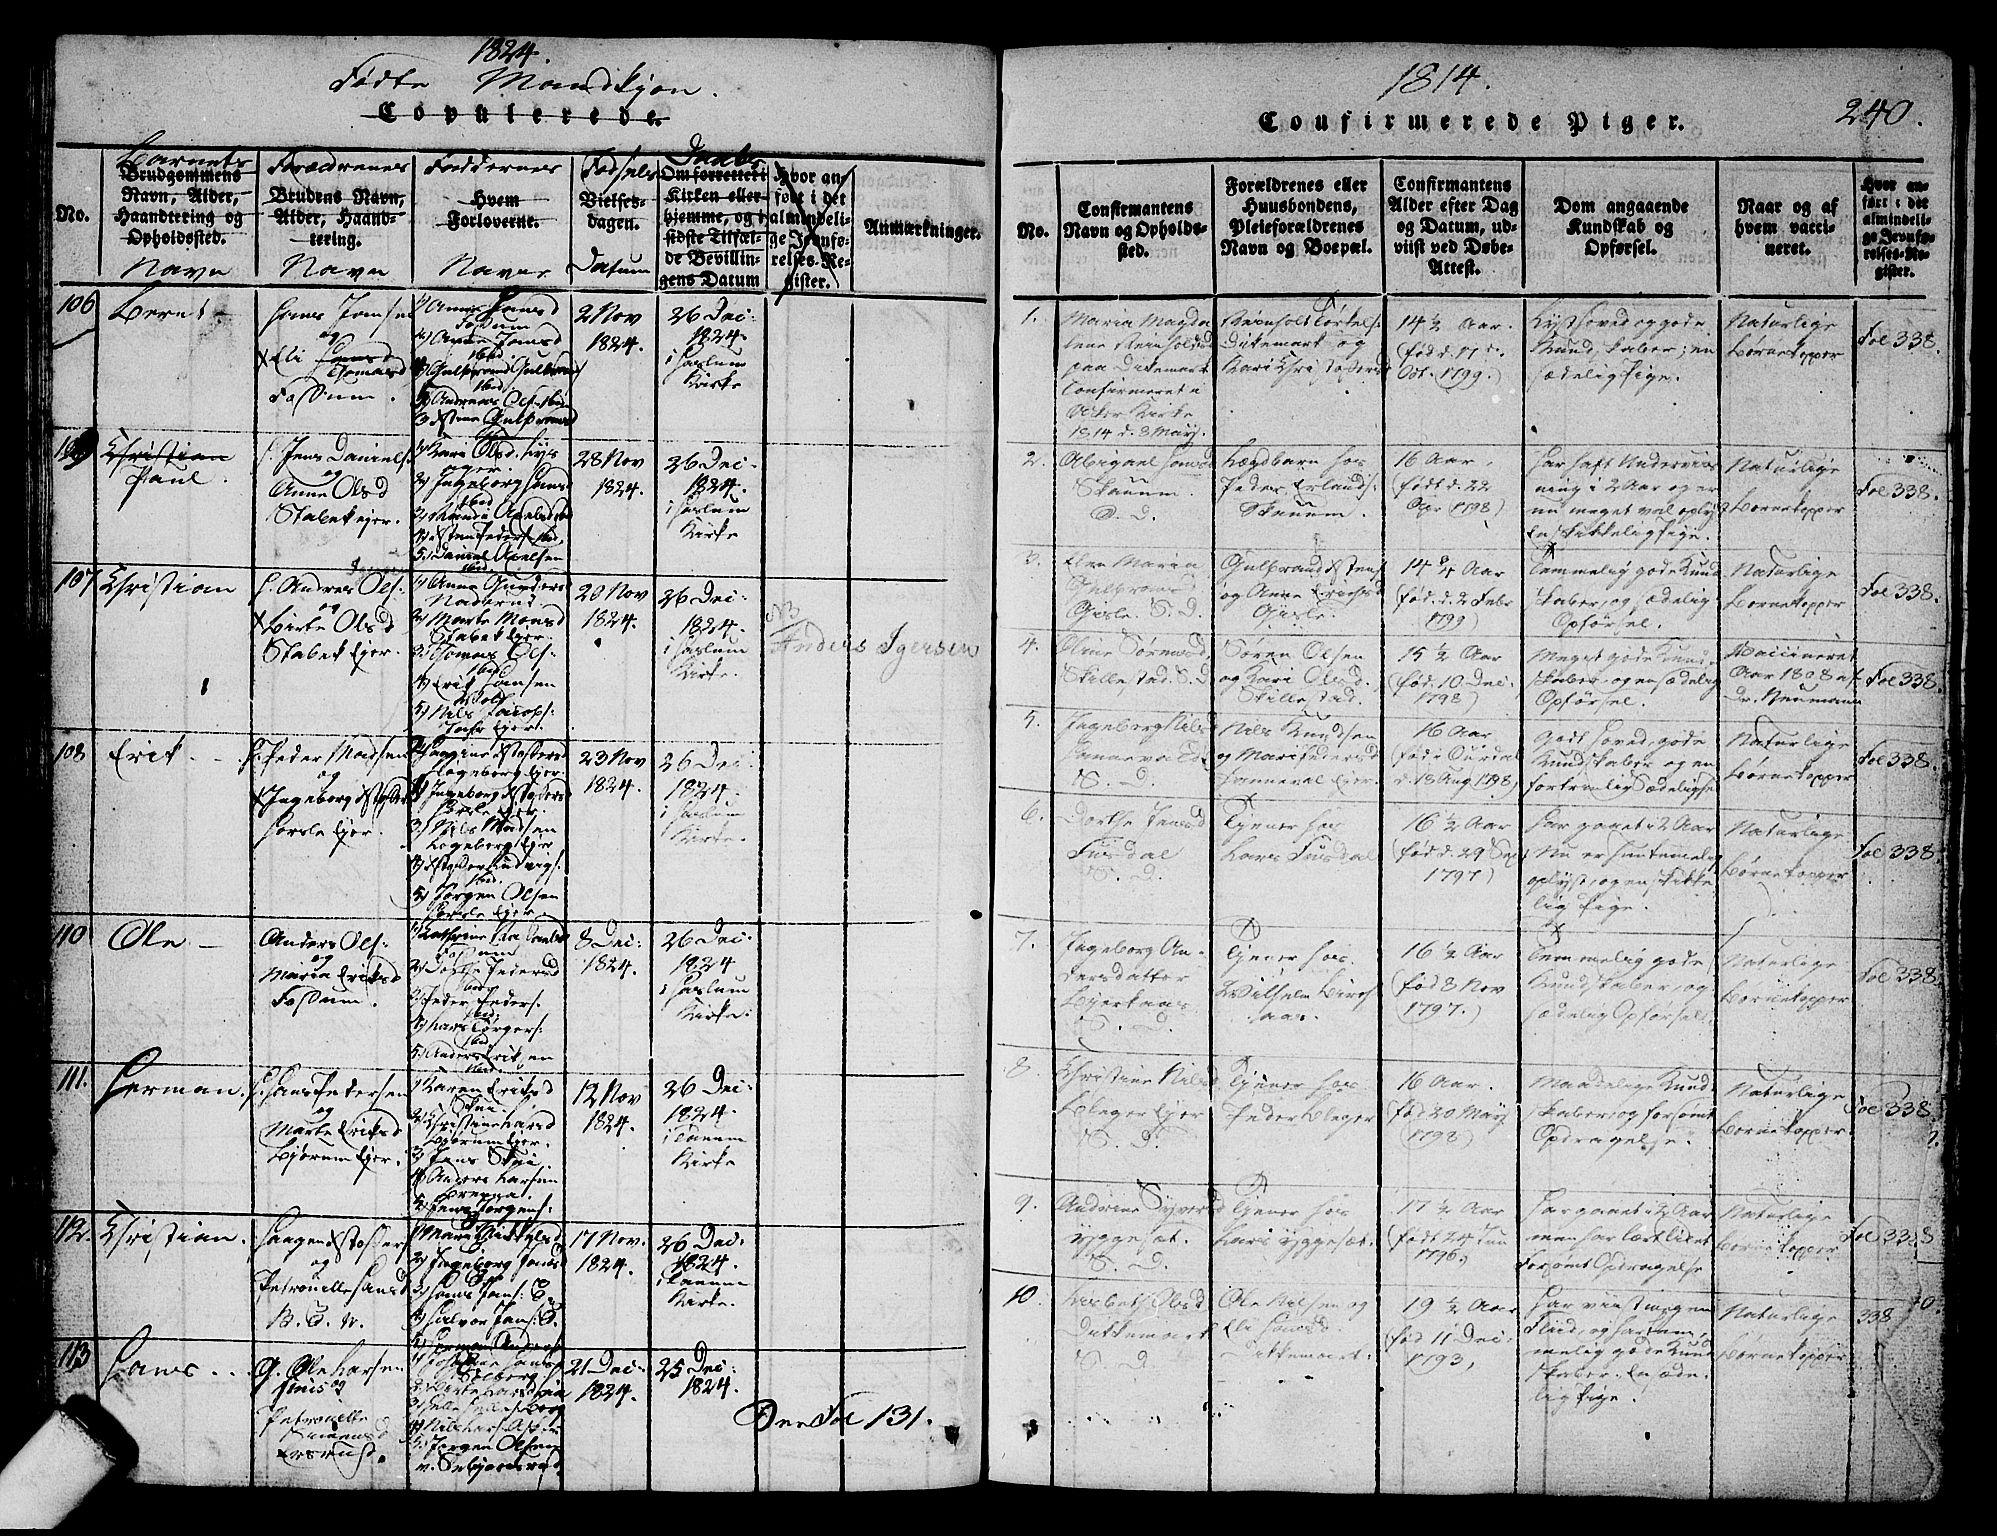 SAO, Asker prestekontor Kirkebøker, G/Ga/L0001: Klokkerbok nr. I 1, 1814-1830, s. 240